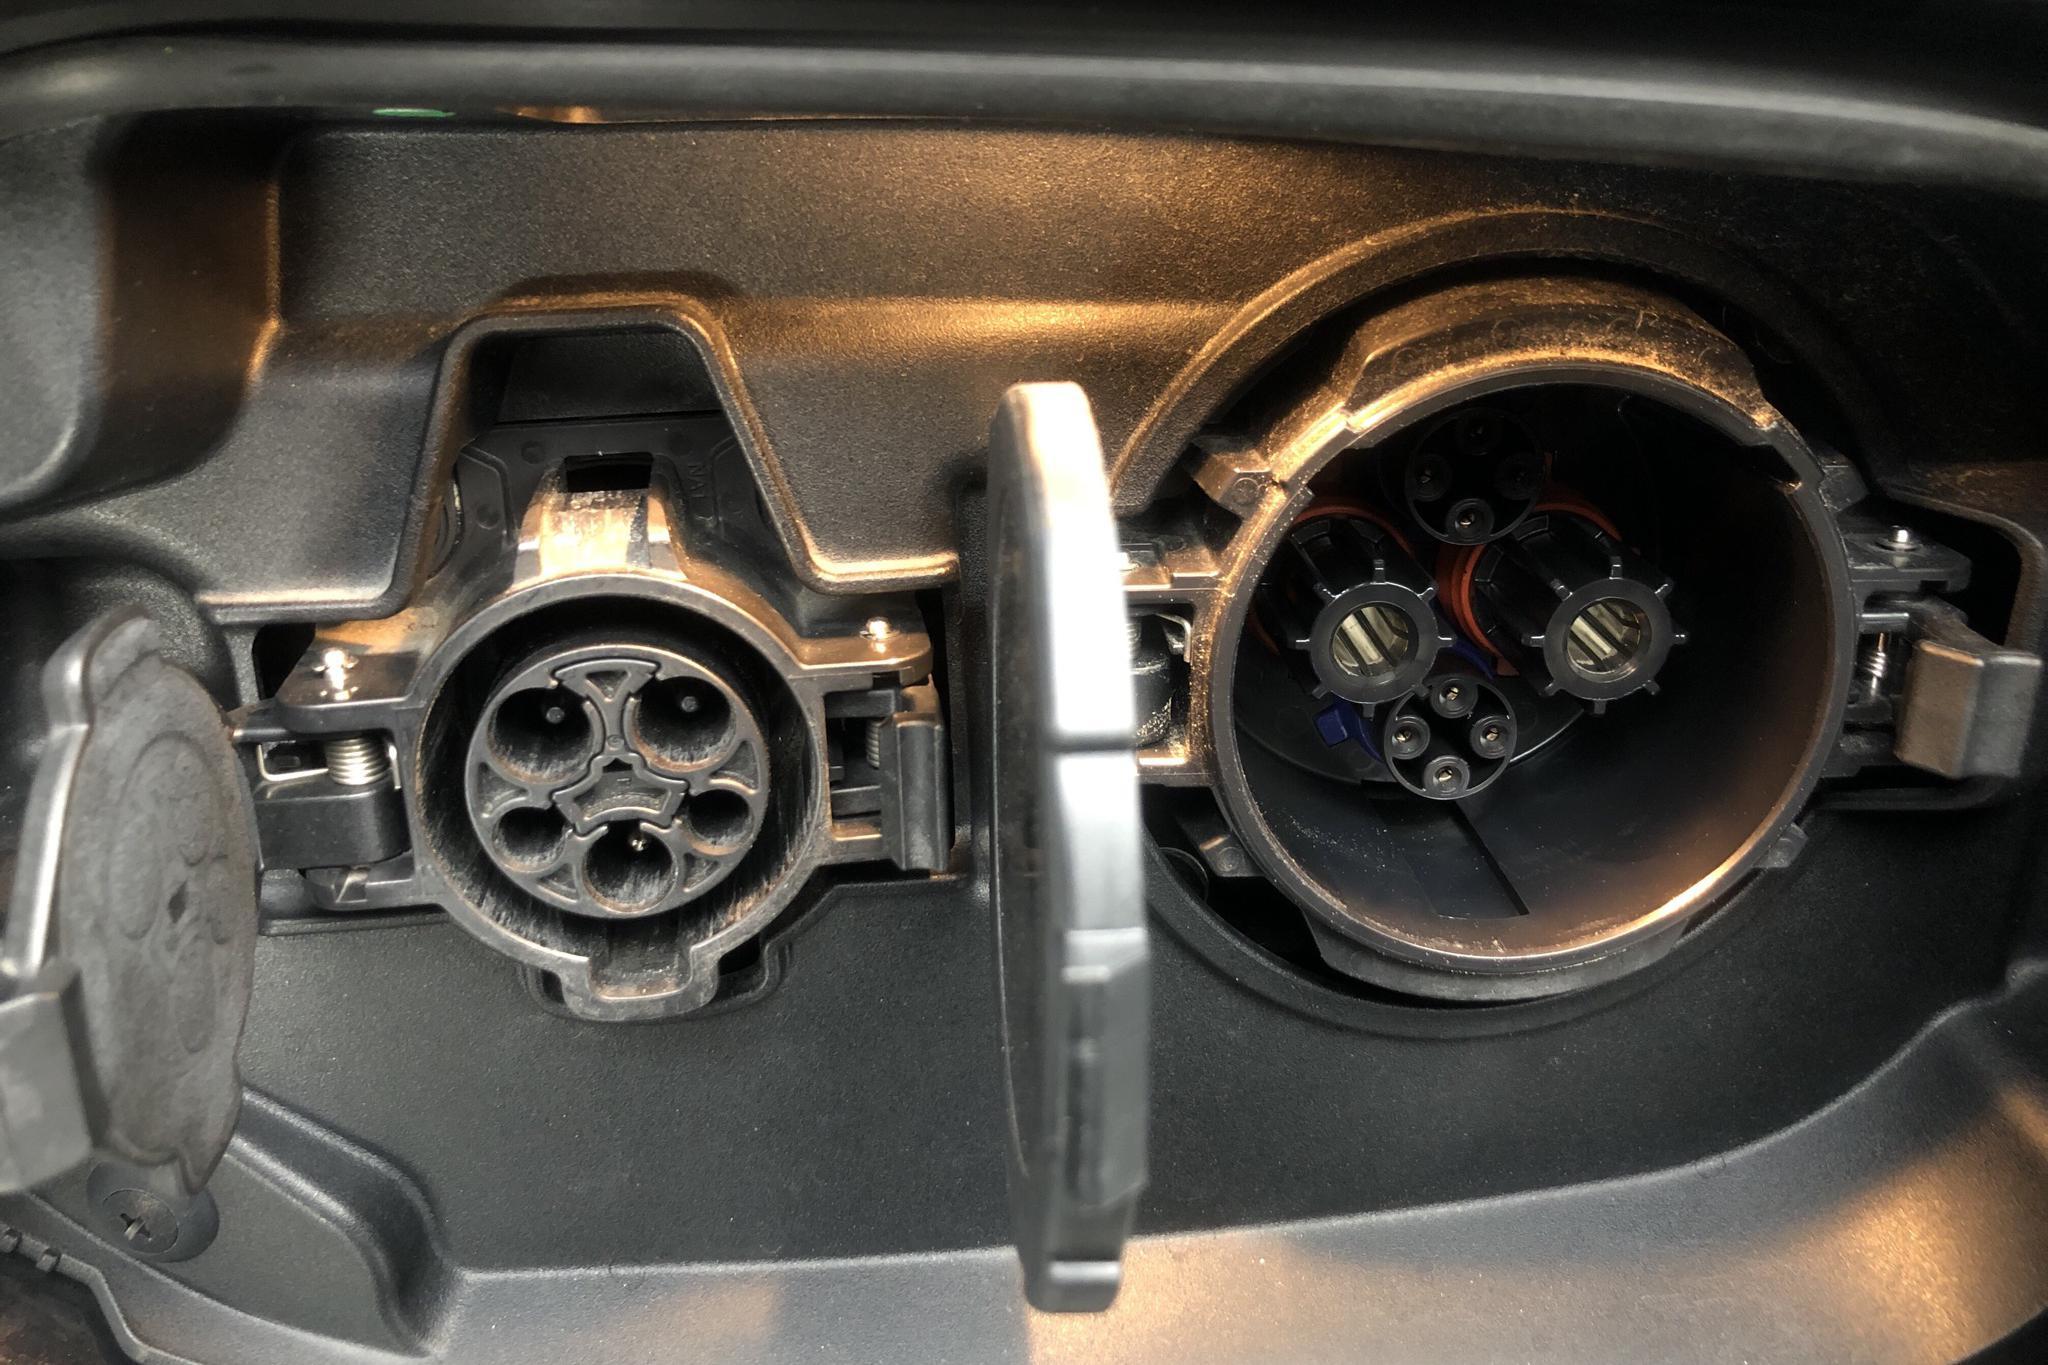 Mitsubishi Outlander 2.4 Plug-in Hybrid 4WD (136hk) - 73 570 km - Automatic - black - 2019